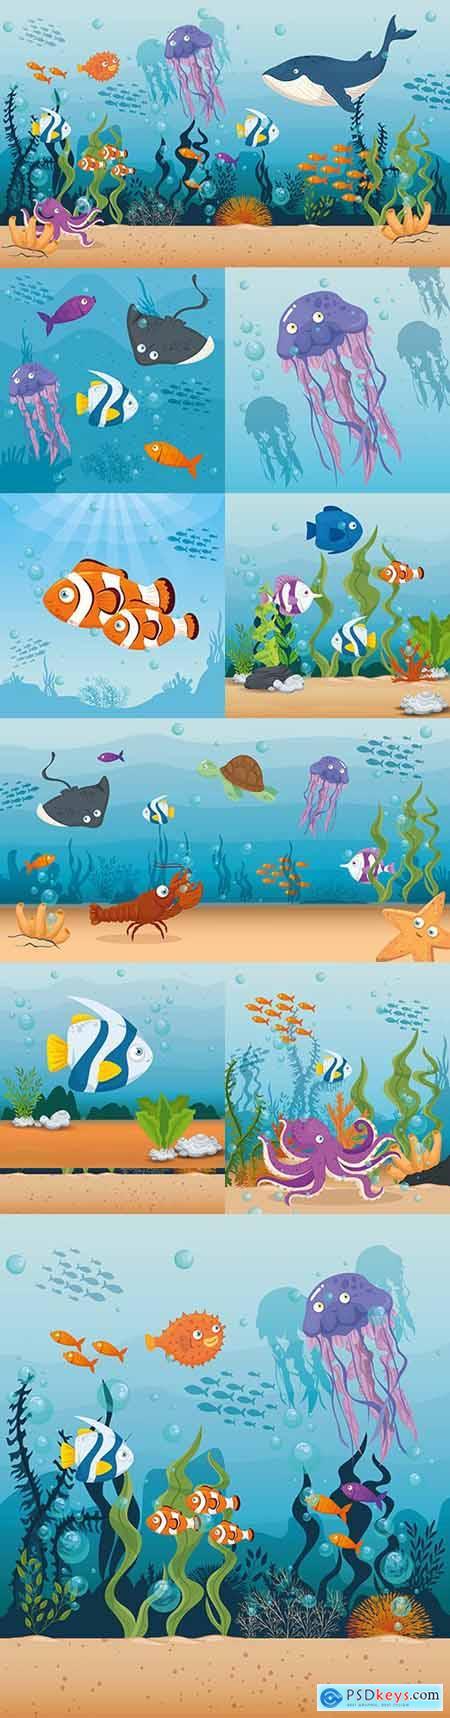 Cute fish and inhabitants of marine world in ocean